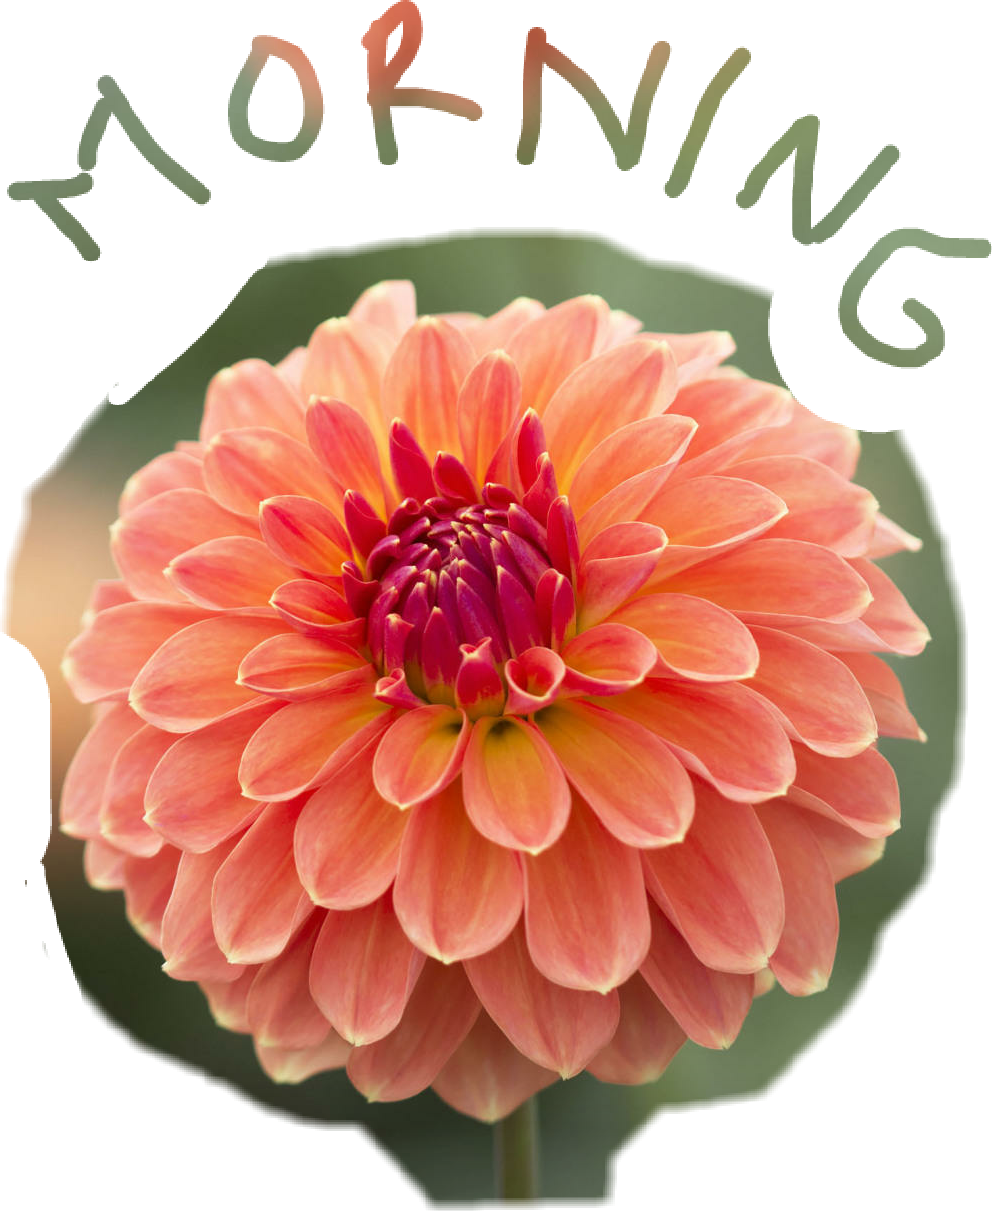 Dahlia flower clipart vector black and white morning good morning dahlia flower flowerphotography... vector black and white